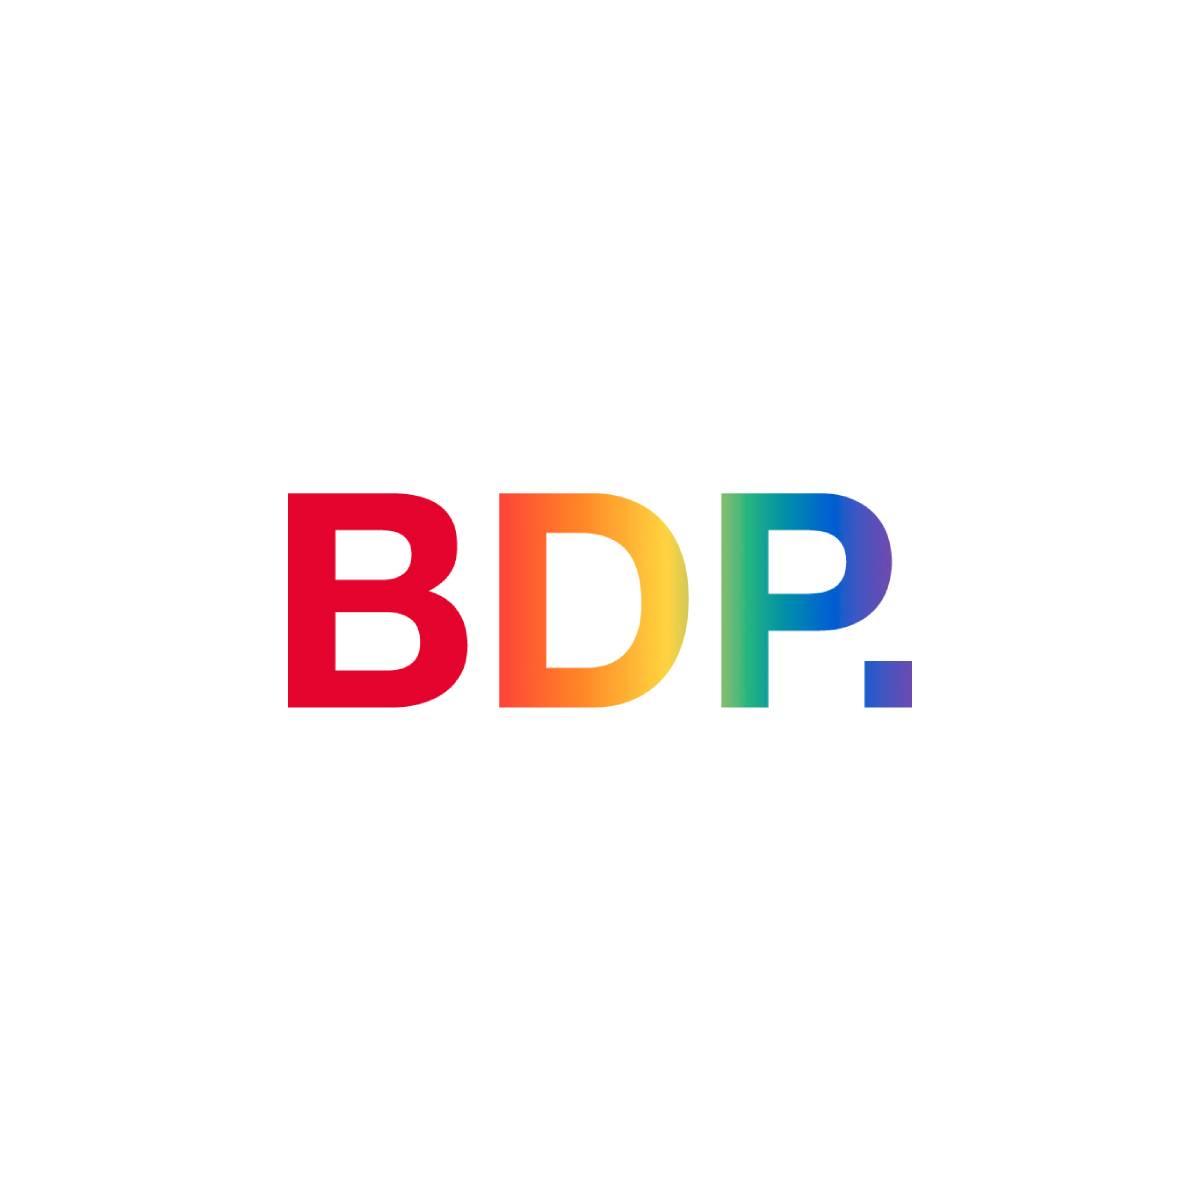 BDP logo.jpg